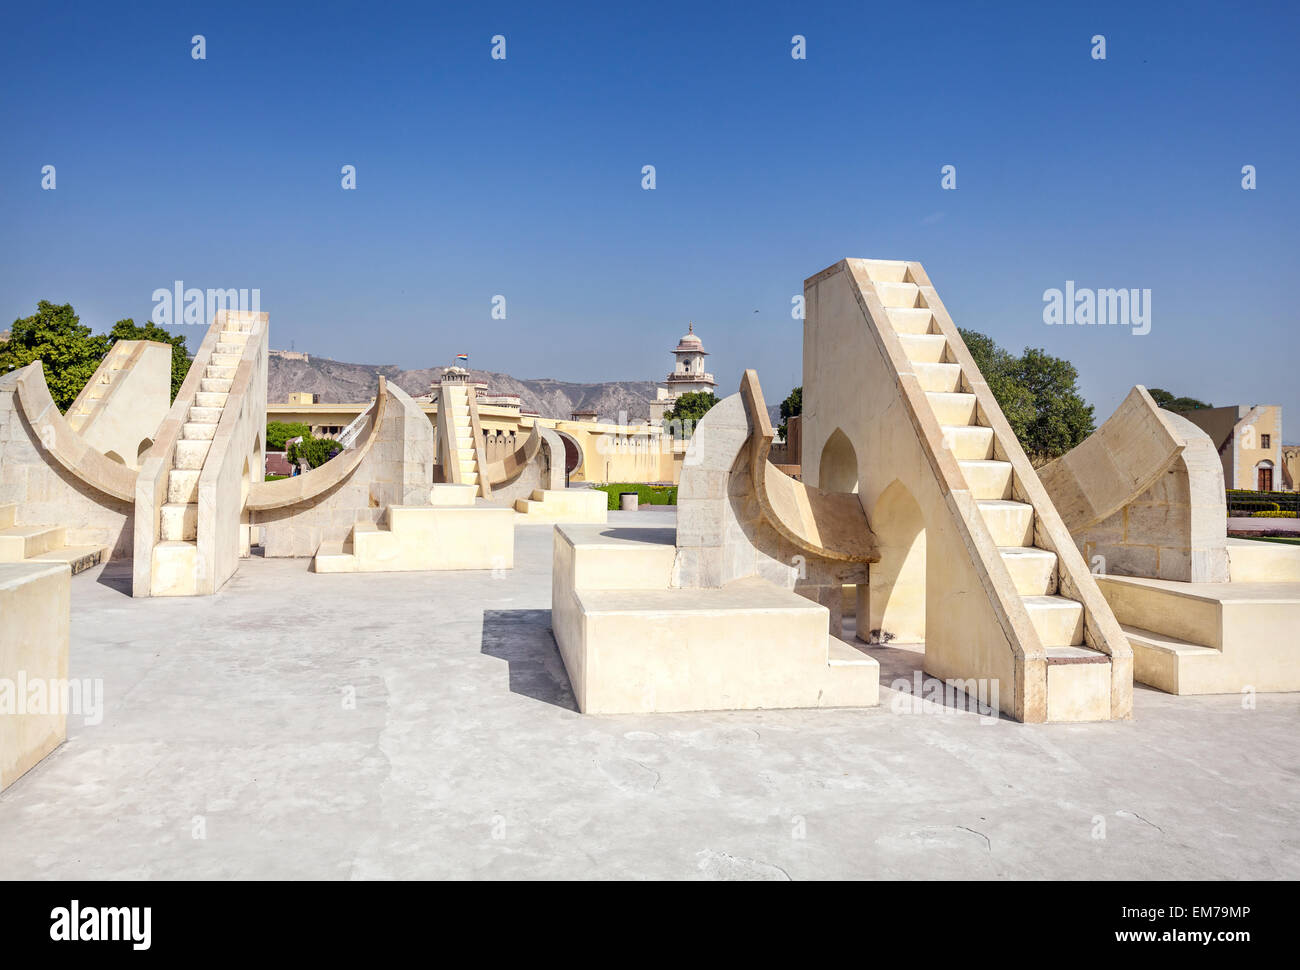 Jantar Mantar observatory complessa al cielo blu a Jaipur, Rajasthan, India Immagini Stock